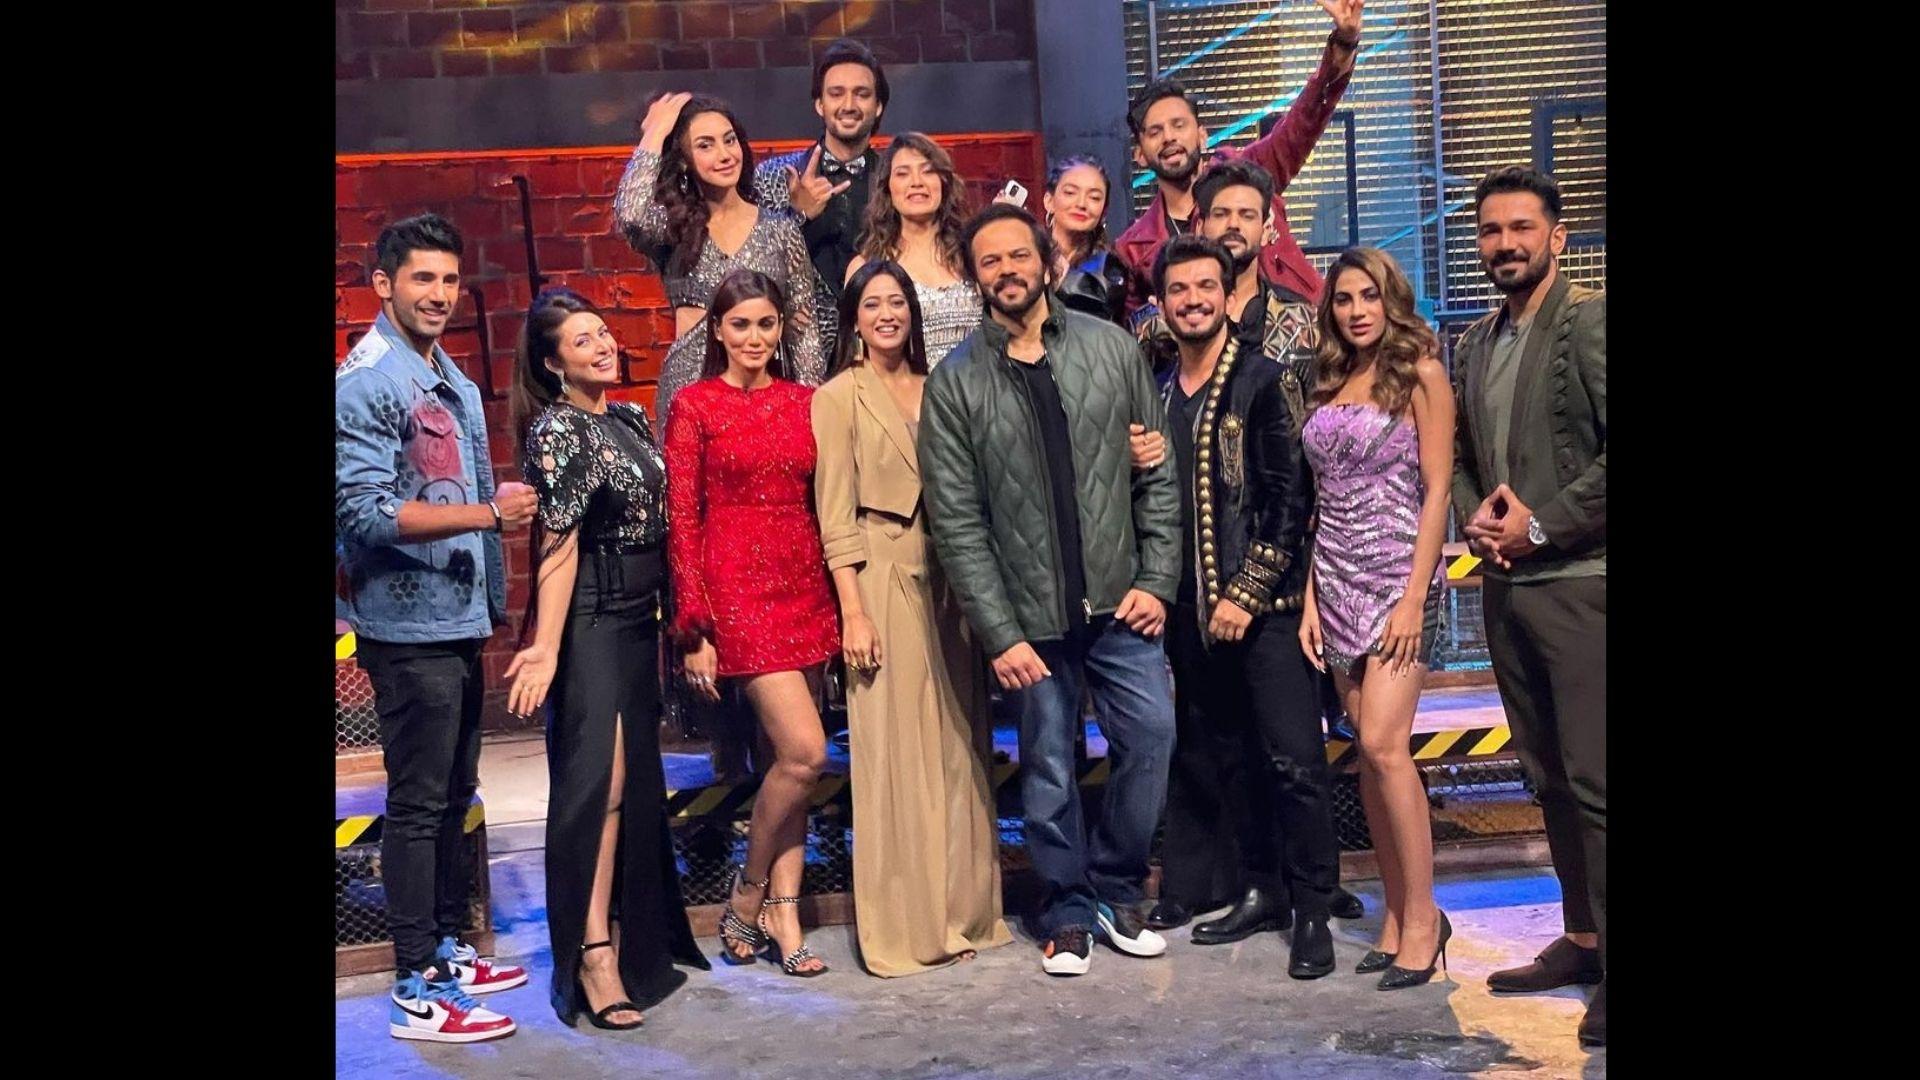 Khatron Ke Khiladi 11: Climax Stunts Of Arjun Bijlani, Divyanka Tripathi Dahiya, Varun Sood That Made The Finale Episode As Grand As It Could Be